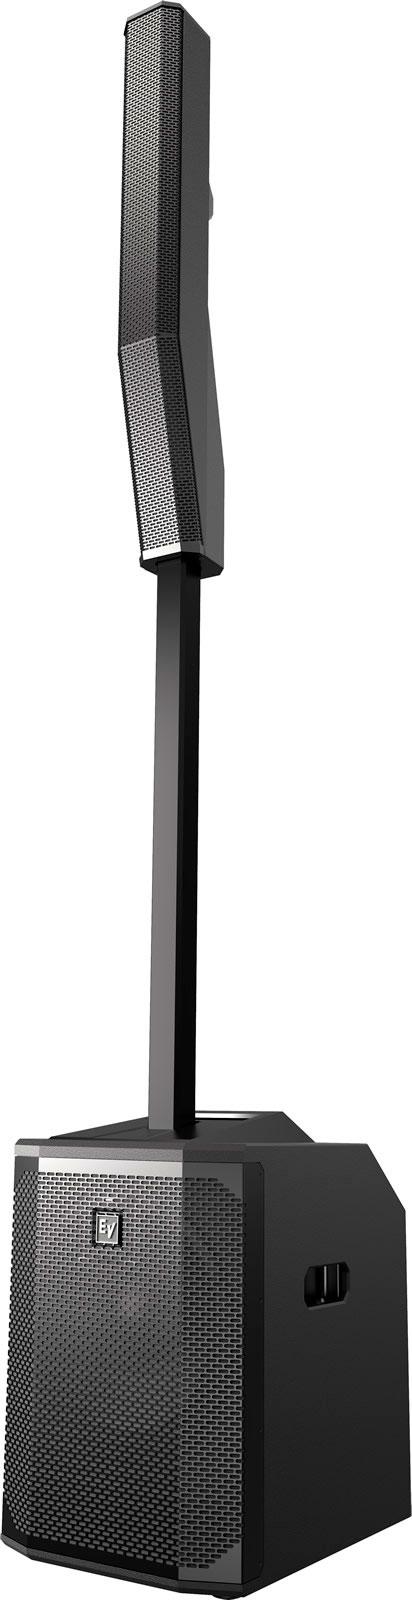 ELECTRO VOICE EVOLVE50-KB (NEGRO)